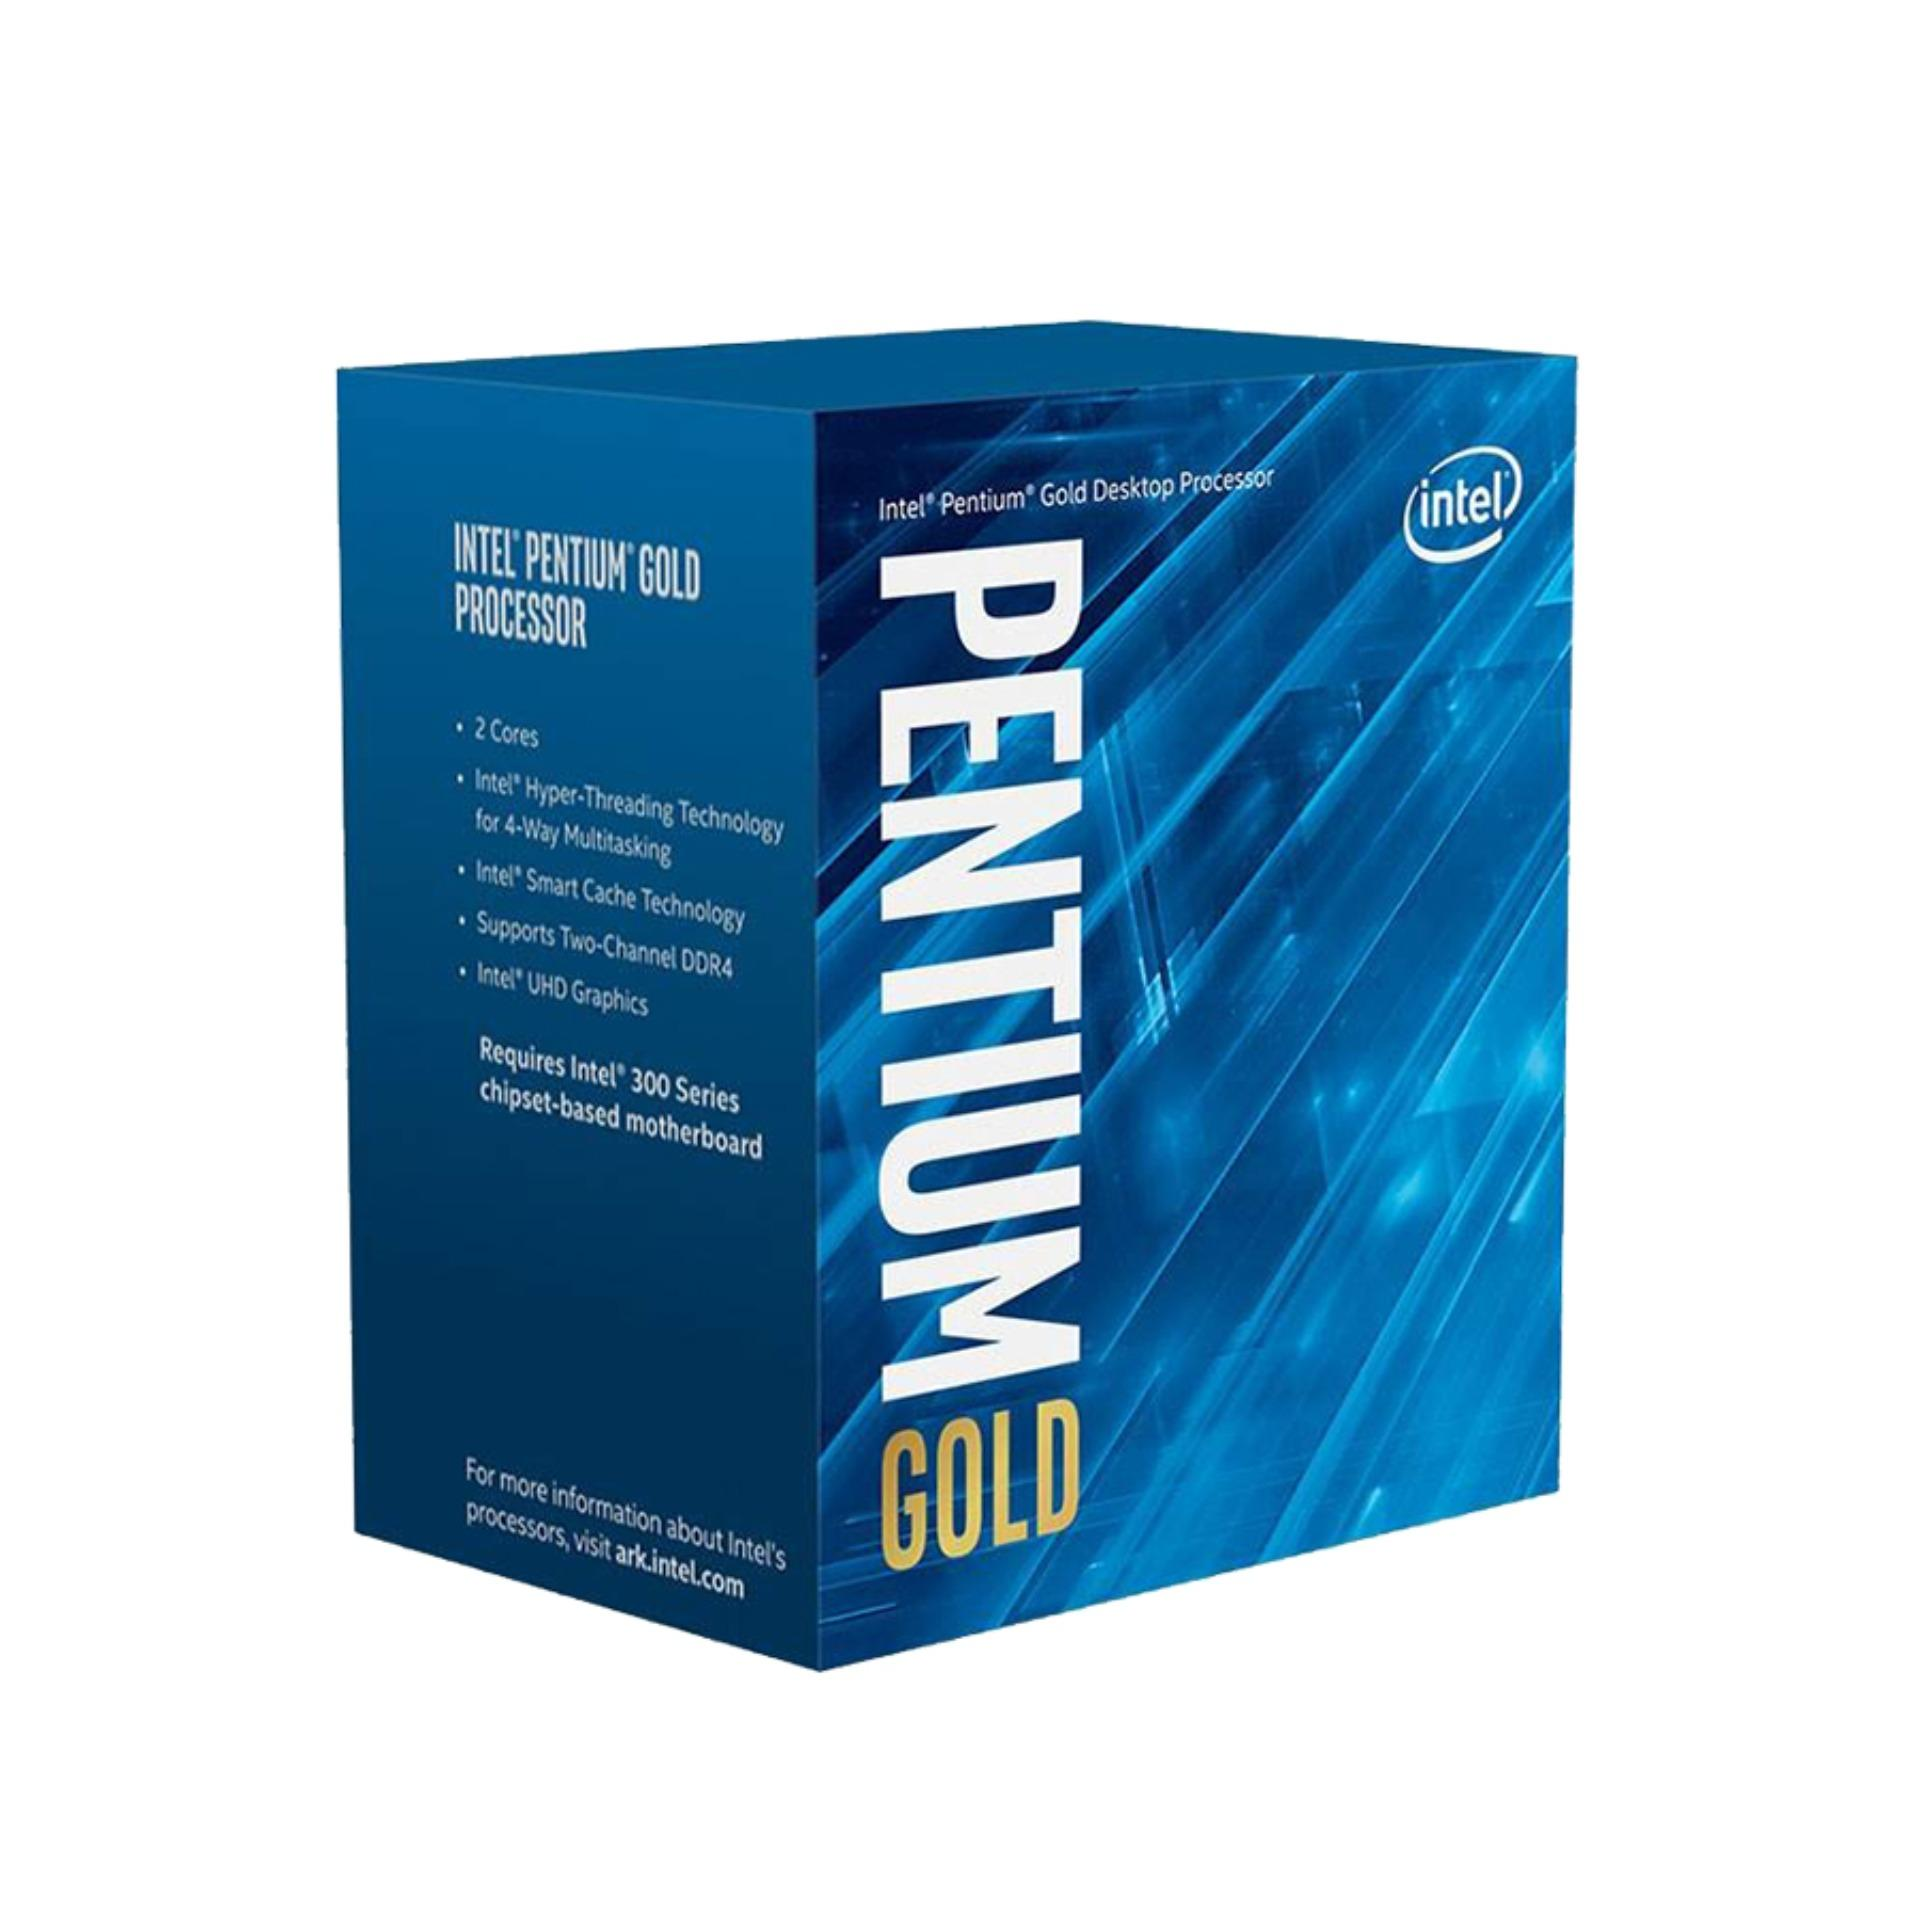 Harga Processor Intel Socket 1155 Karmashares Llc Leveraging Core I5 2400 Tray Fan Ori Pentium G5400 Gold Coffeelake 1151 37ghz 4m